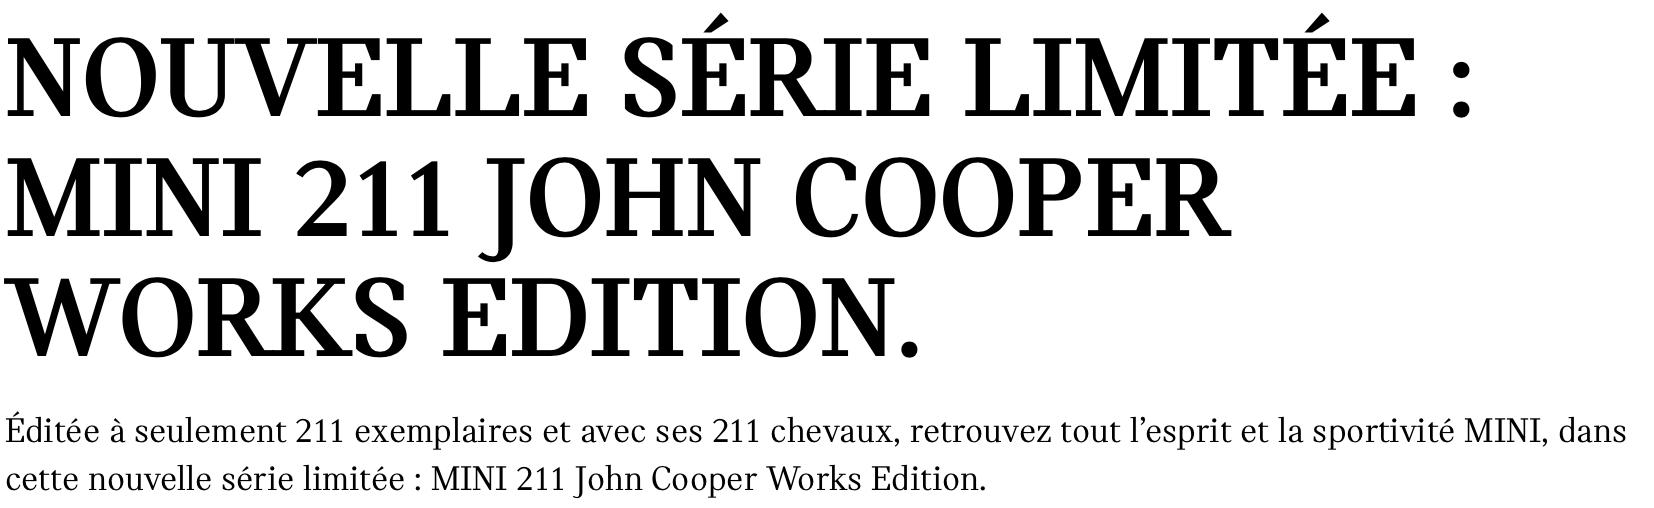 MINI Cooper S 211 John Cooper Works Edition, 211 en France! 1 à Lescar!